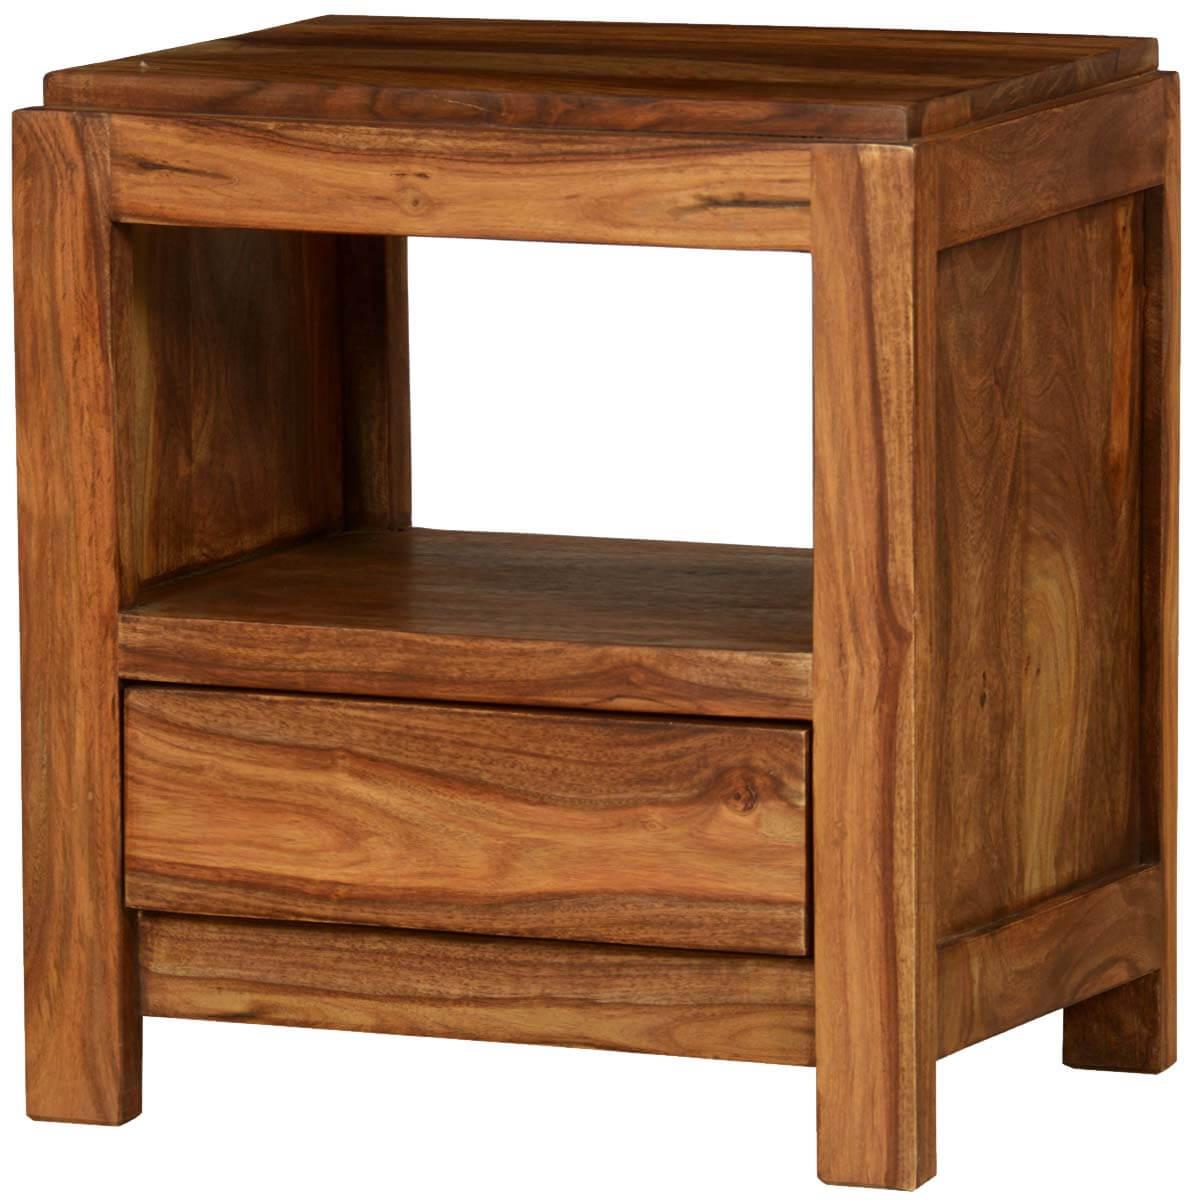 Pioneer modern rustic solid wood nightstand end table w drawer for Rustic nightstands